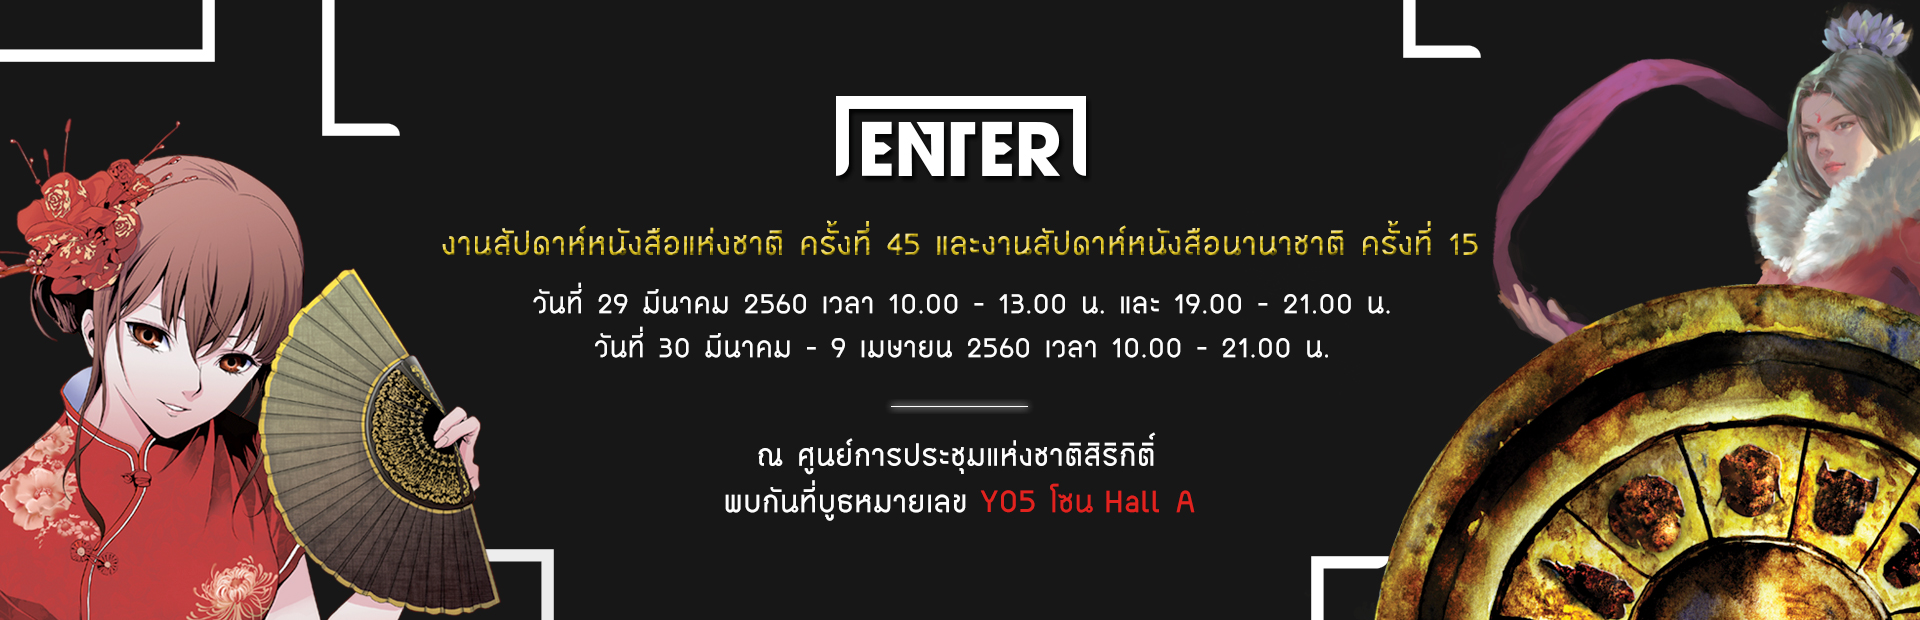 Banner1920_Bangkok International Book Fair2017